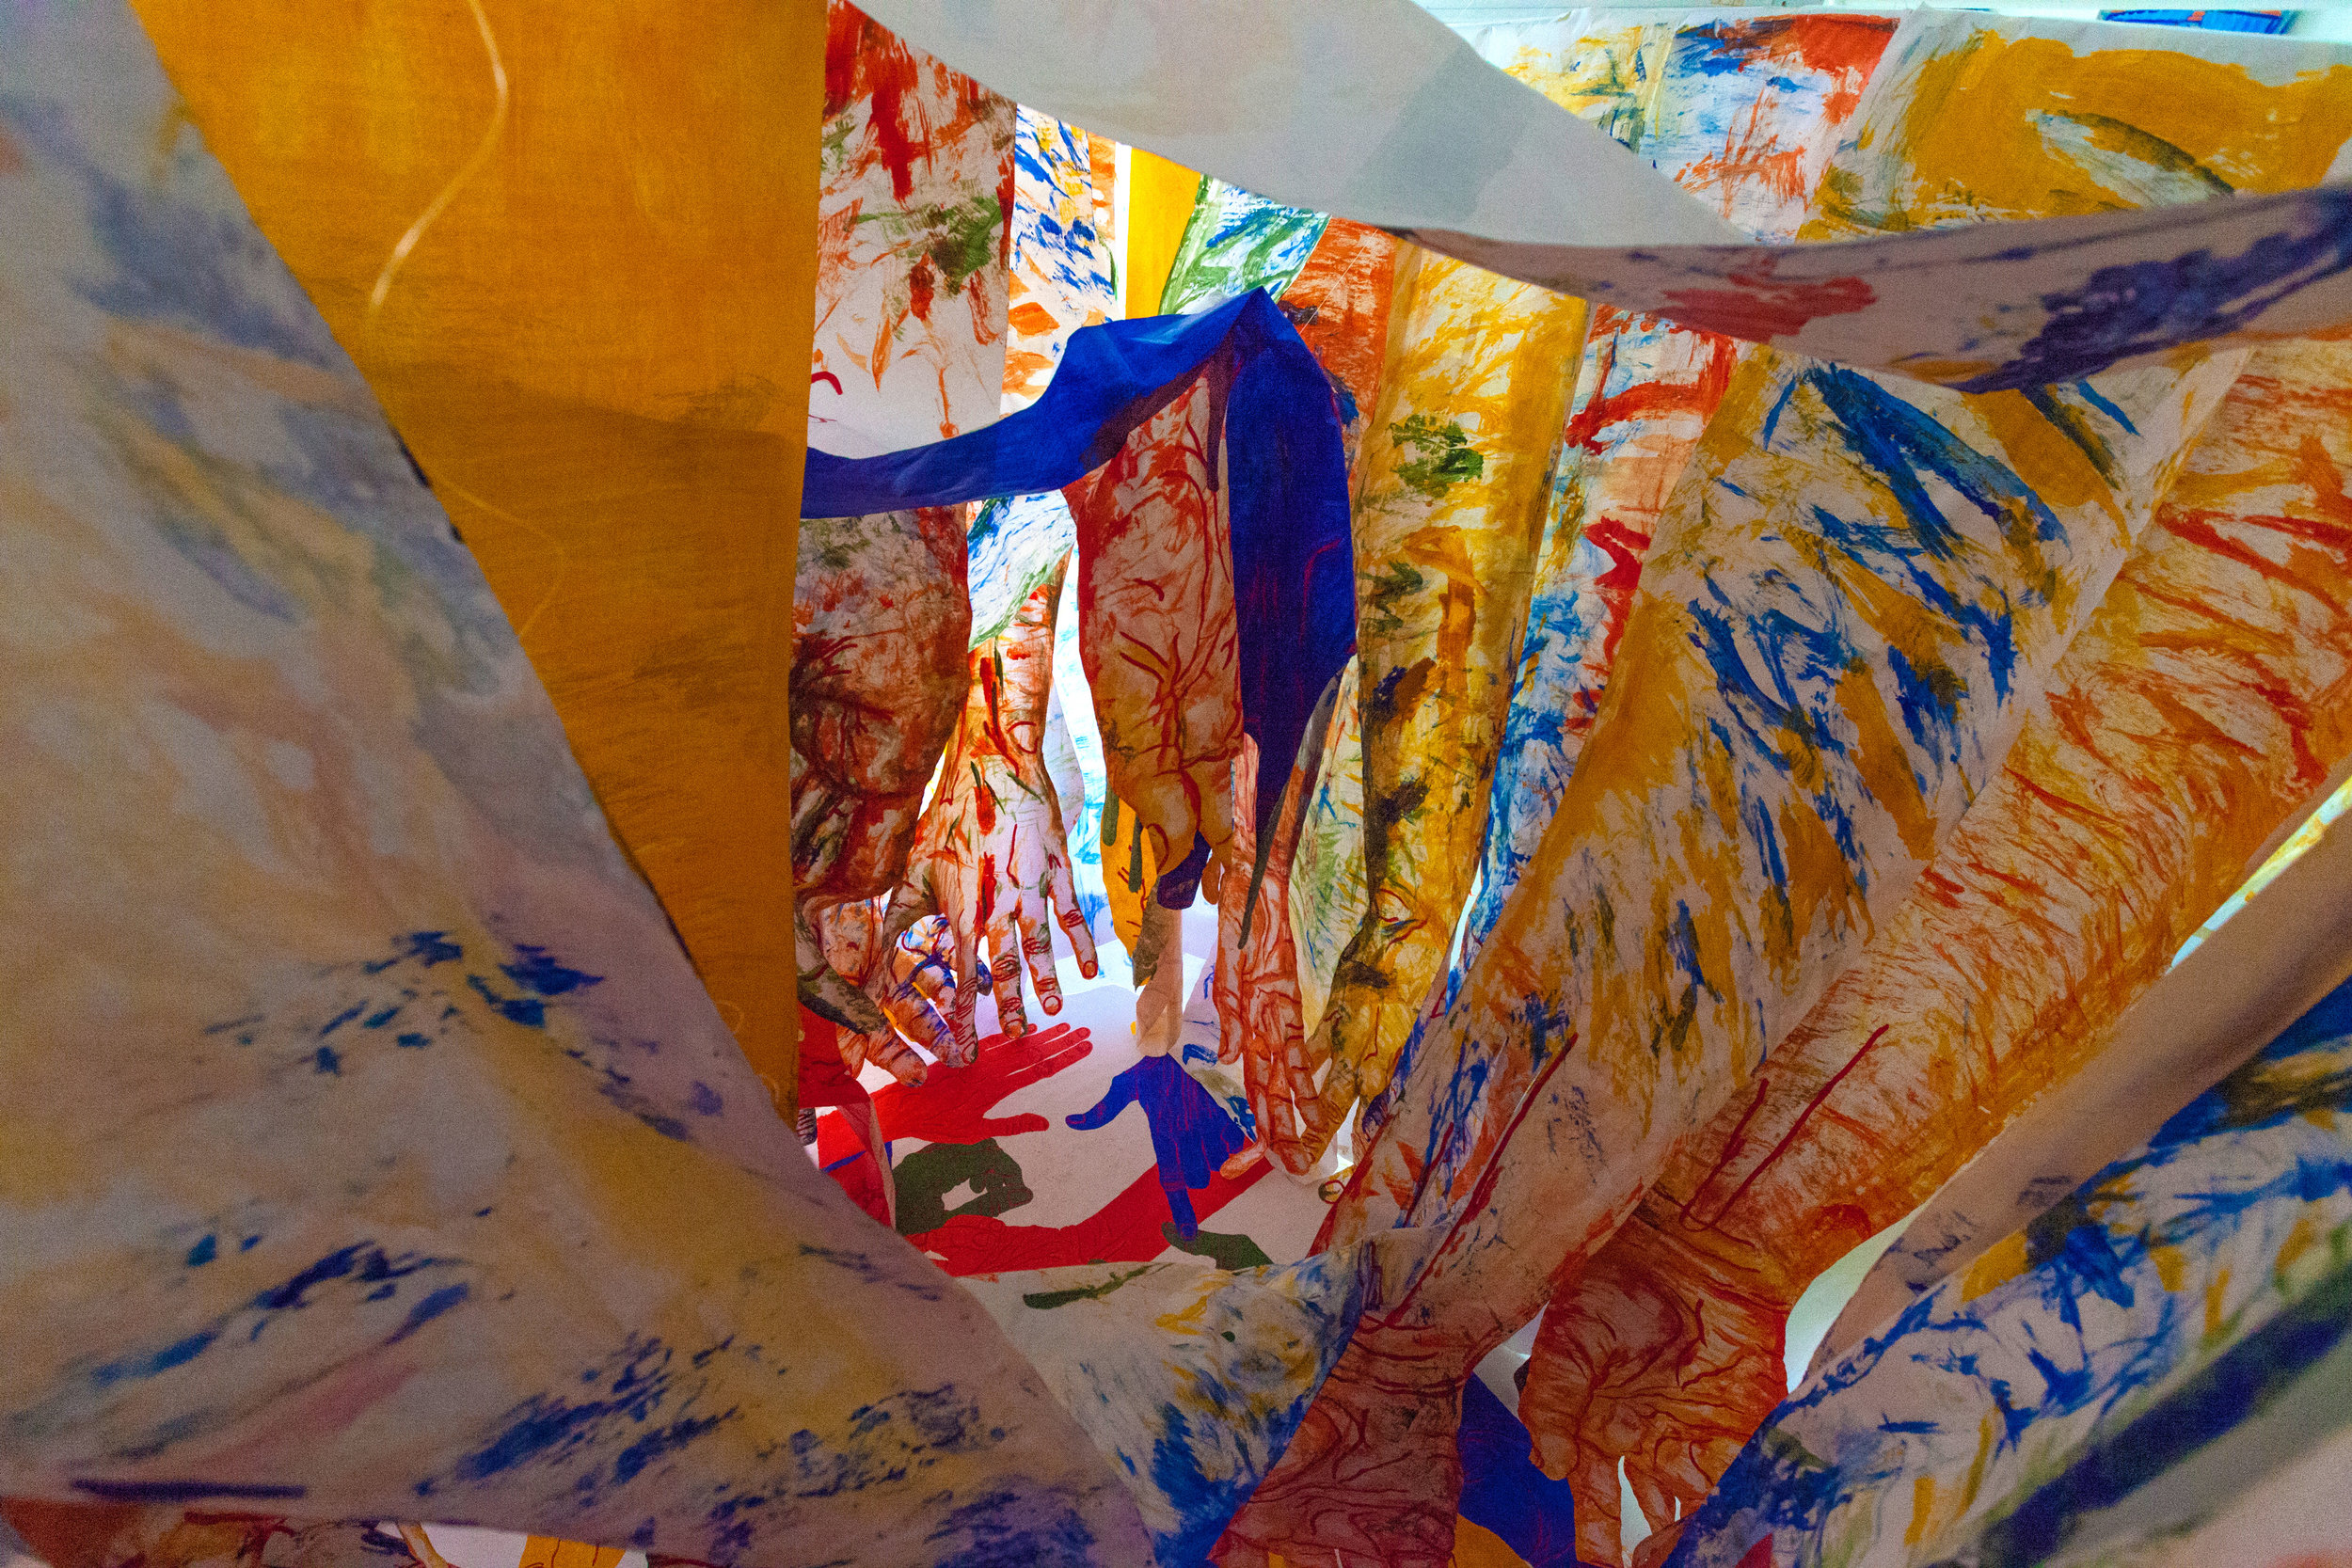 hands-tesseract-tangled-up-hands-mirena-rhee-installation_06.jpg